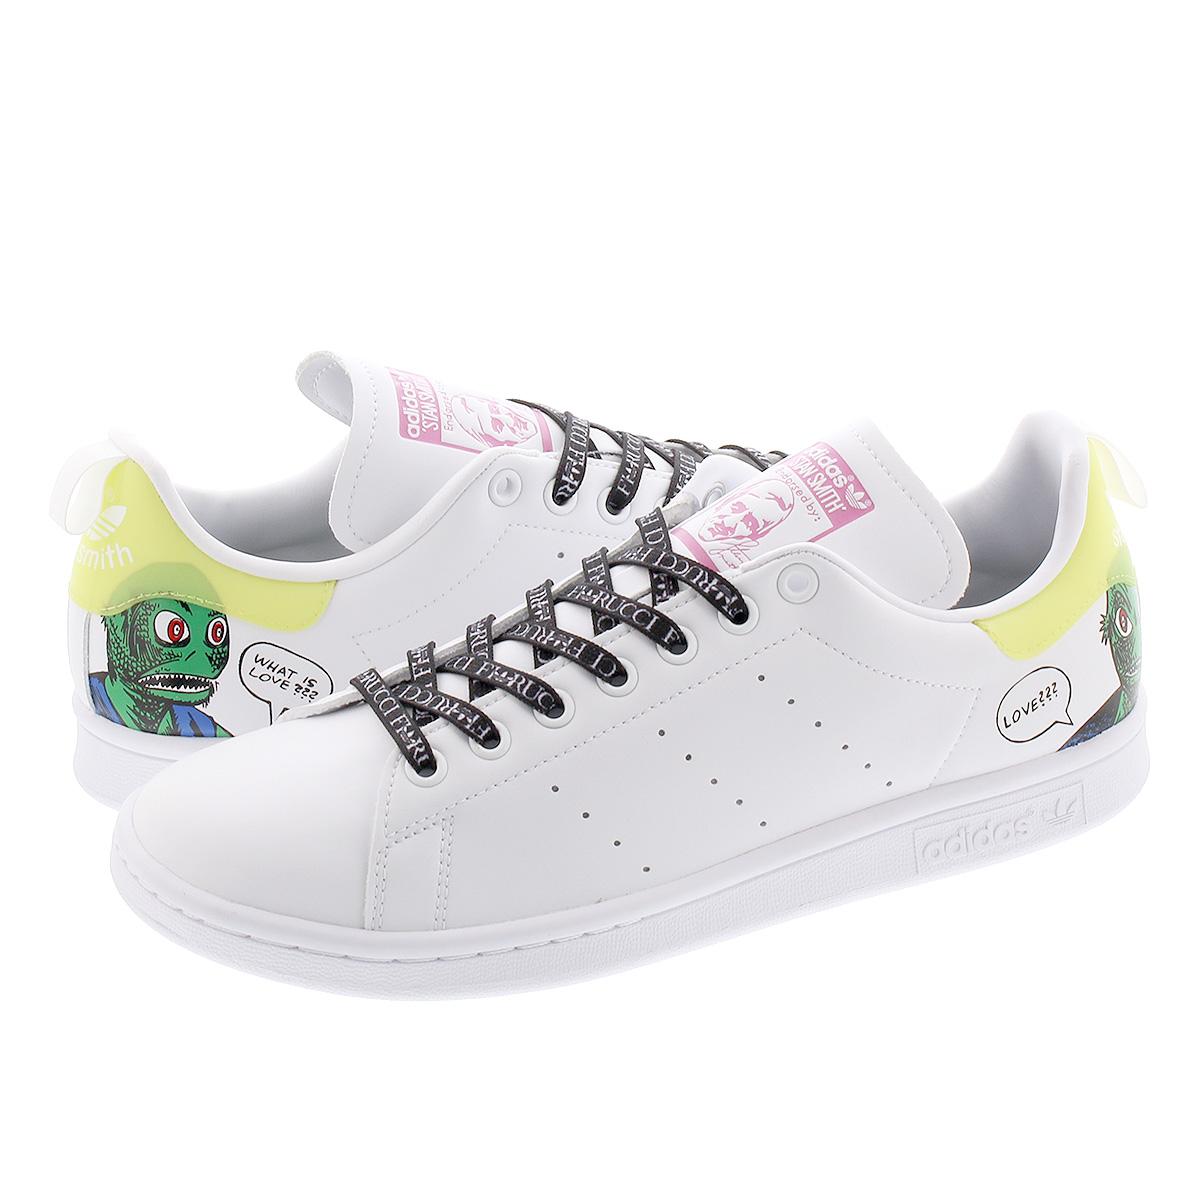 adidas stan smith love